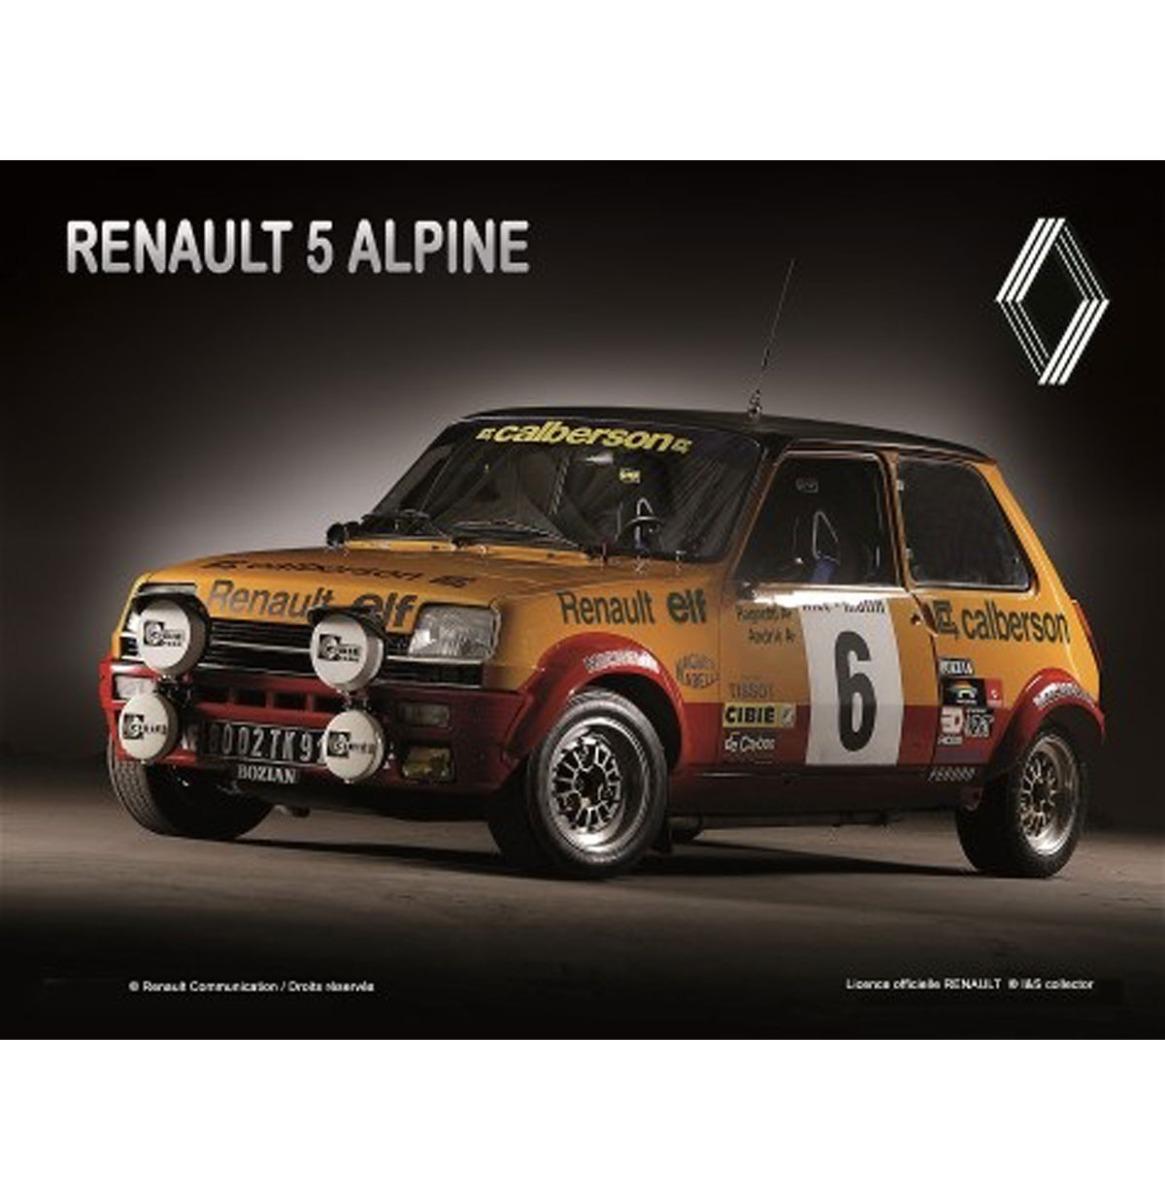 Metalen Bord 40x30cm Renault R5 Alpine Calberson